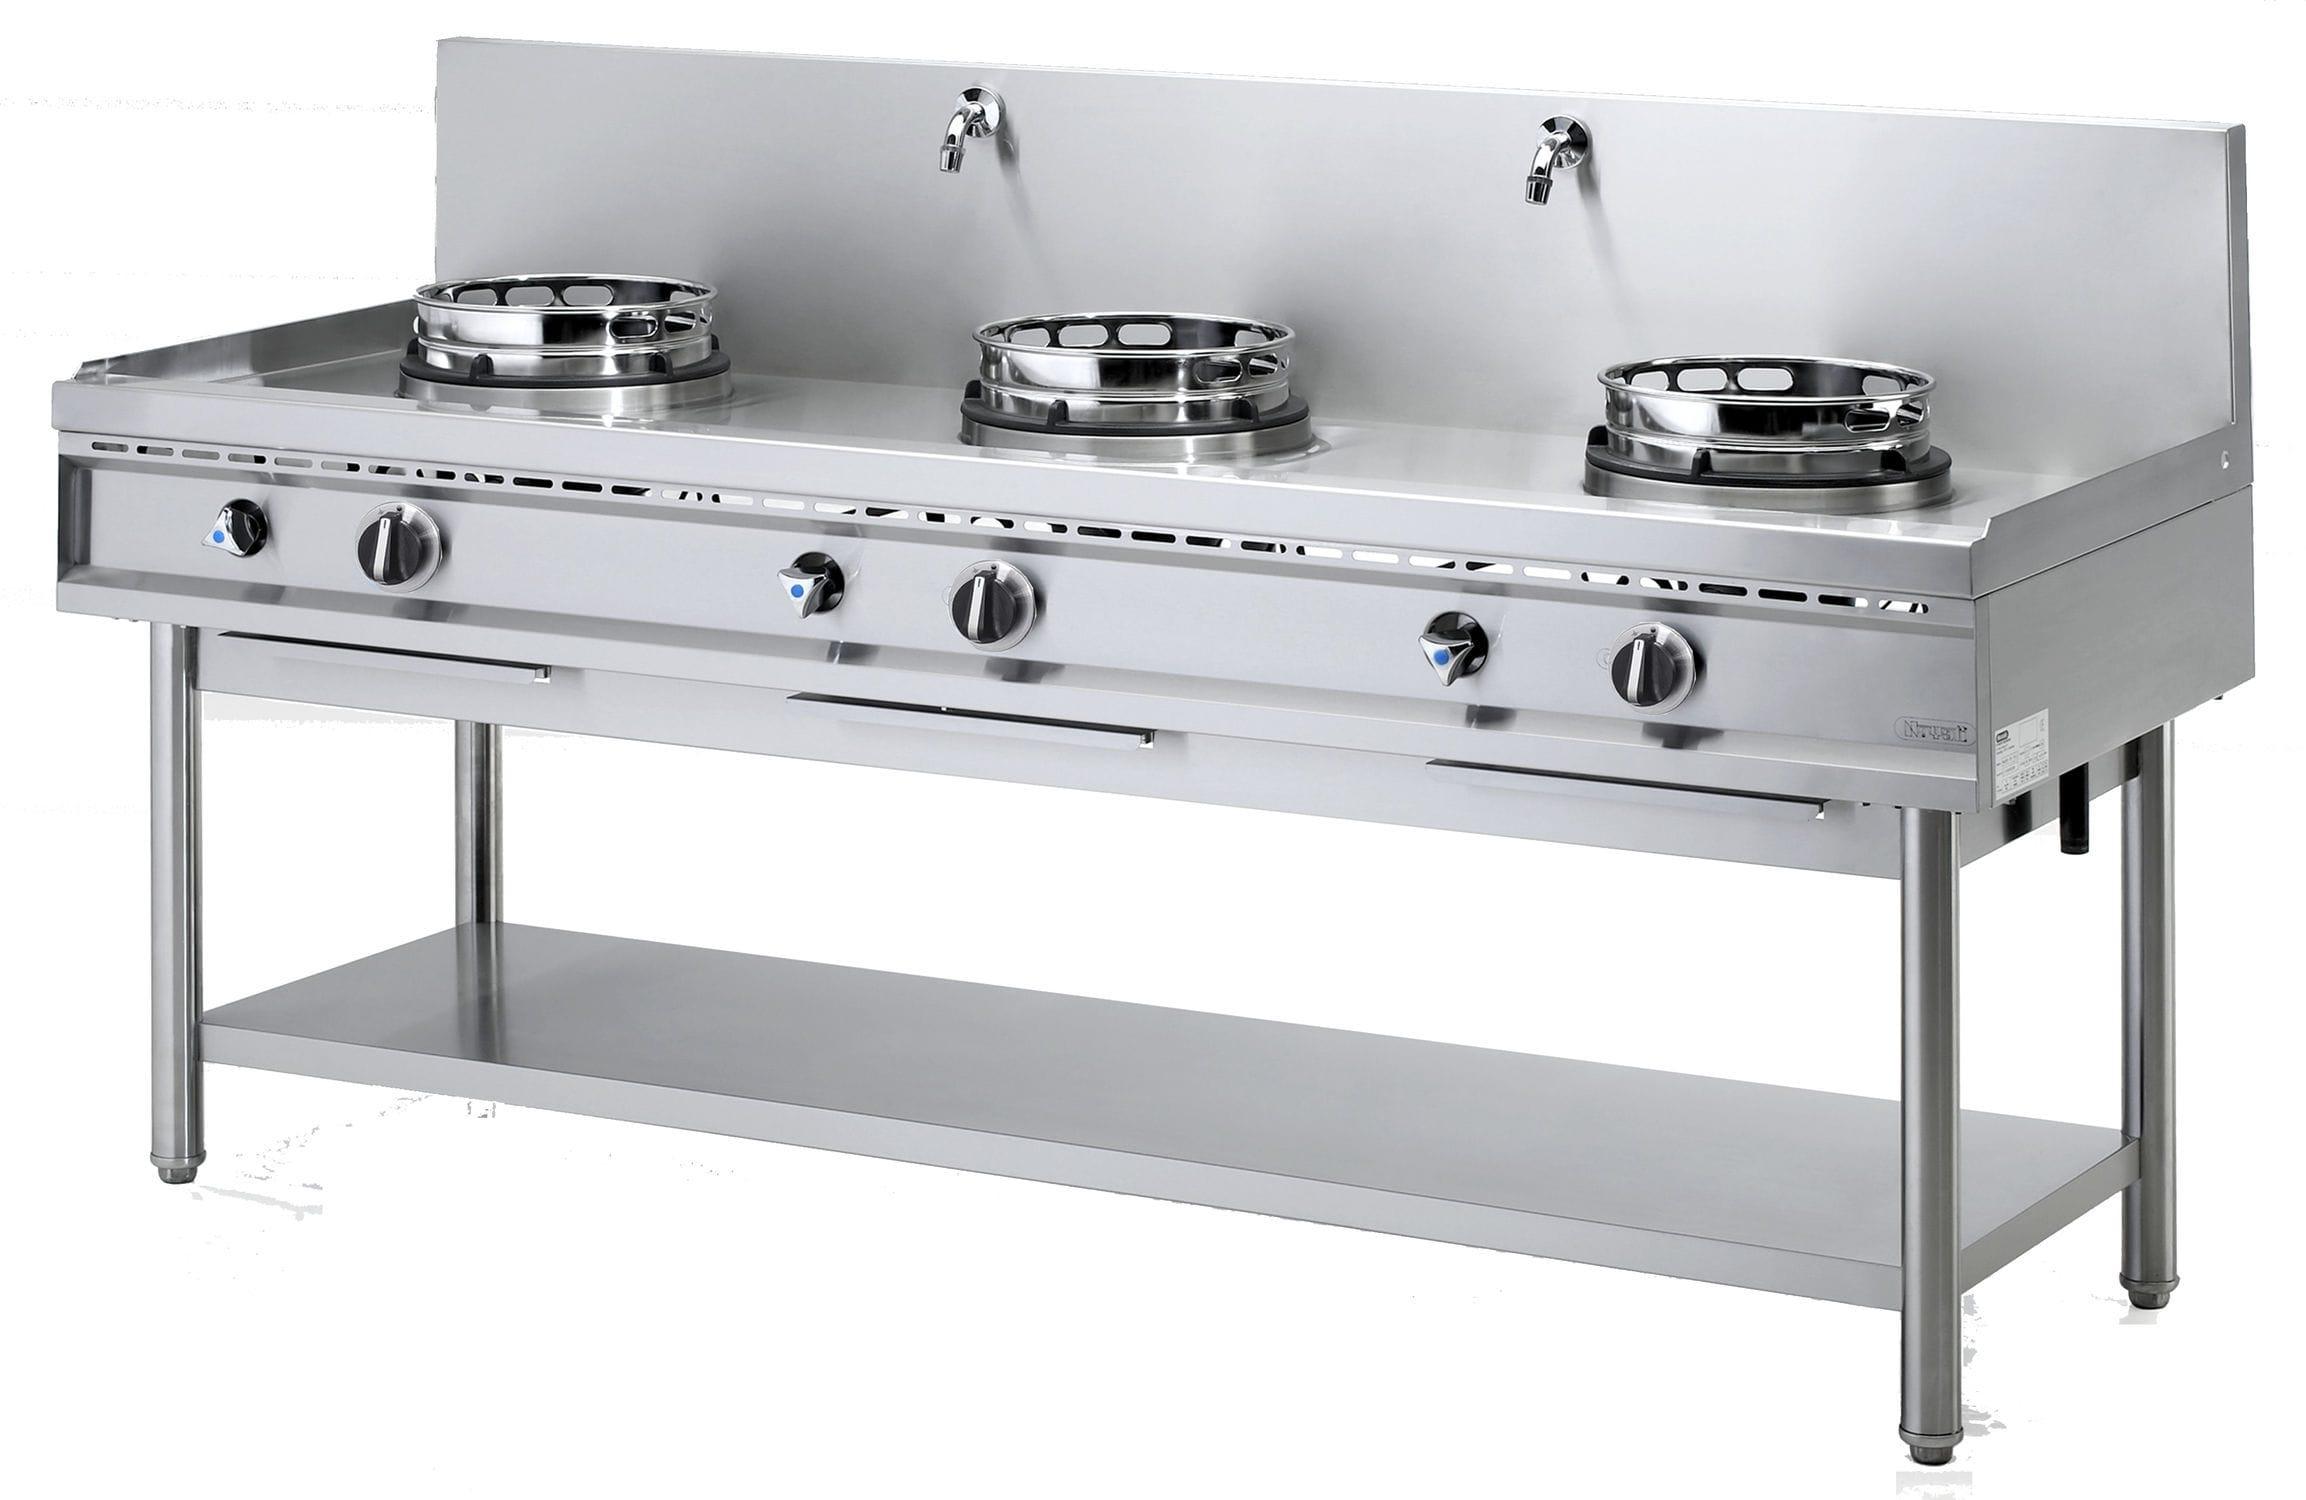 gas range cooker commercial wok nger